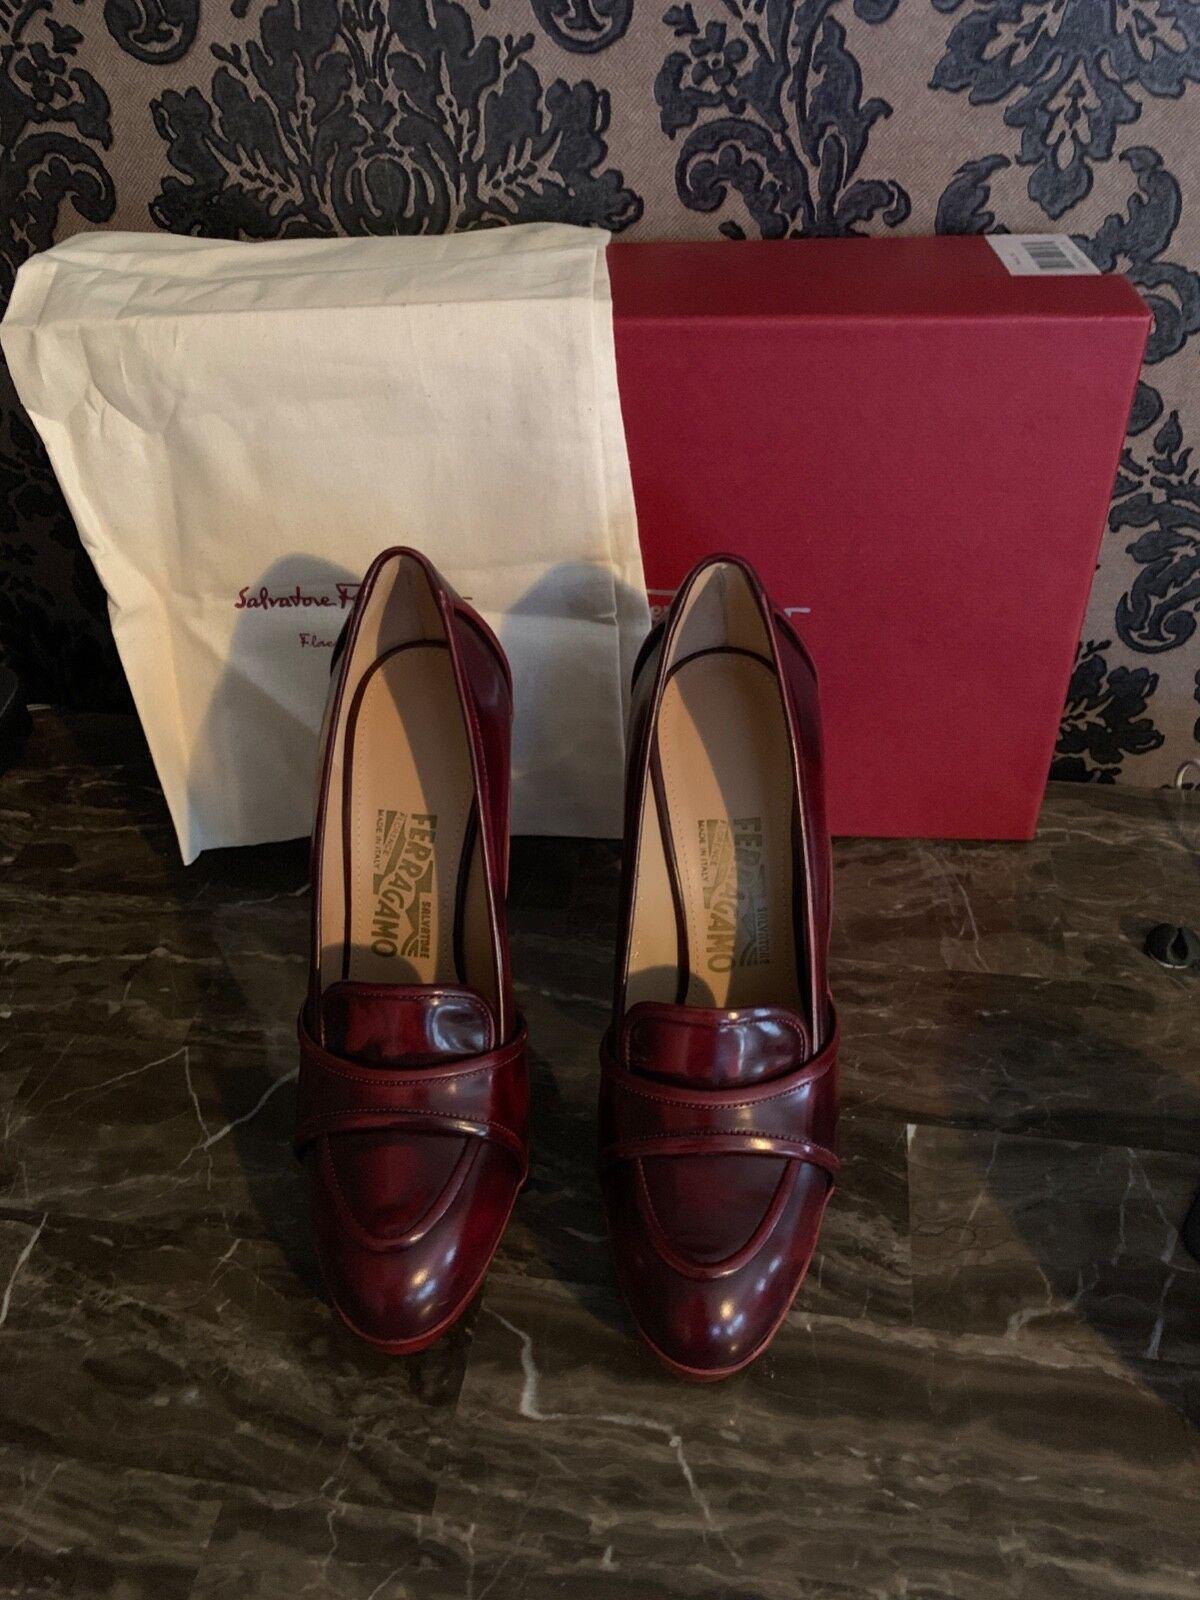 NEW FERRAGAMO REINA red red burgundy merlot loafer heels pumps shoes 7 37 Hot